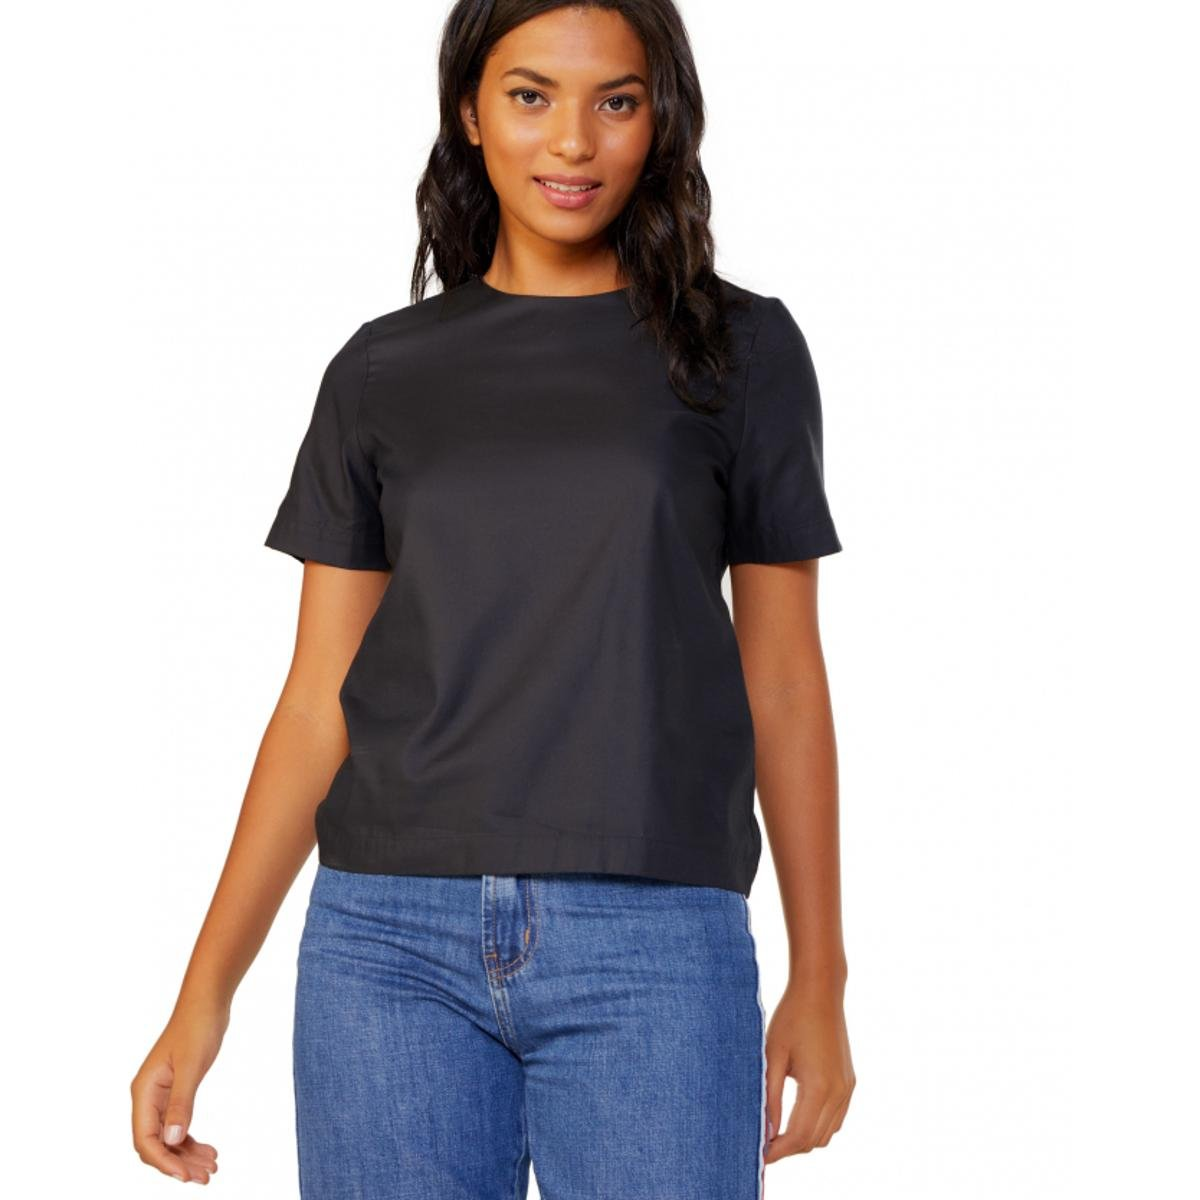 Camiseta Amaro Tricoline Essential - Preto - Compre Agora   Zattini 49af685172